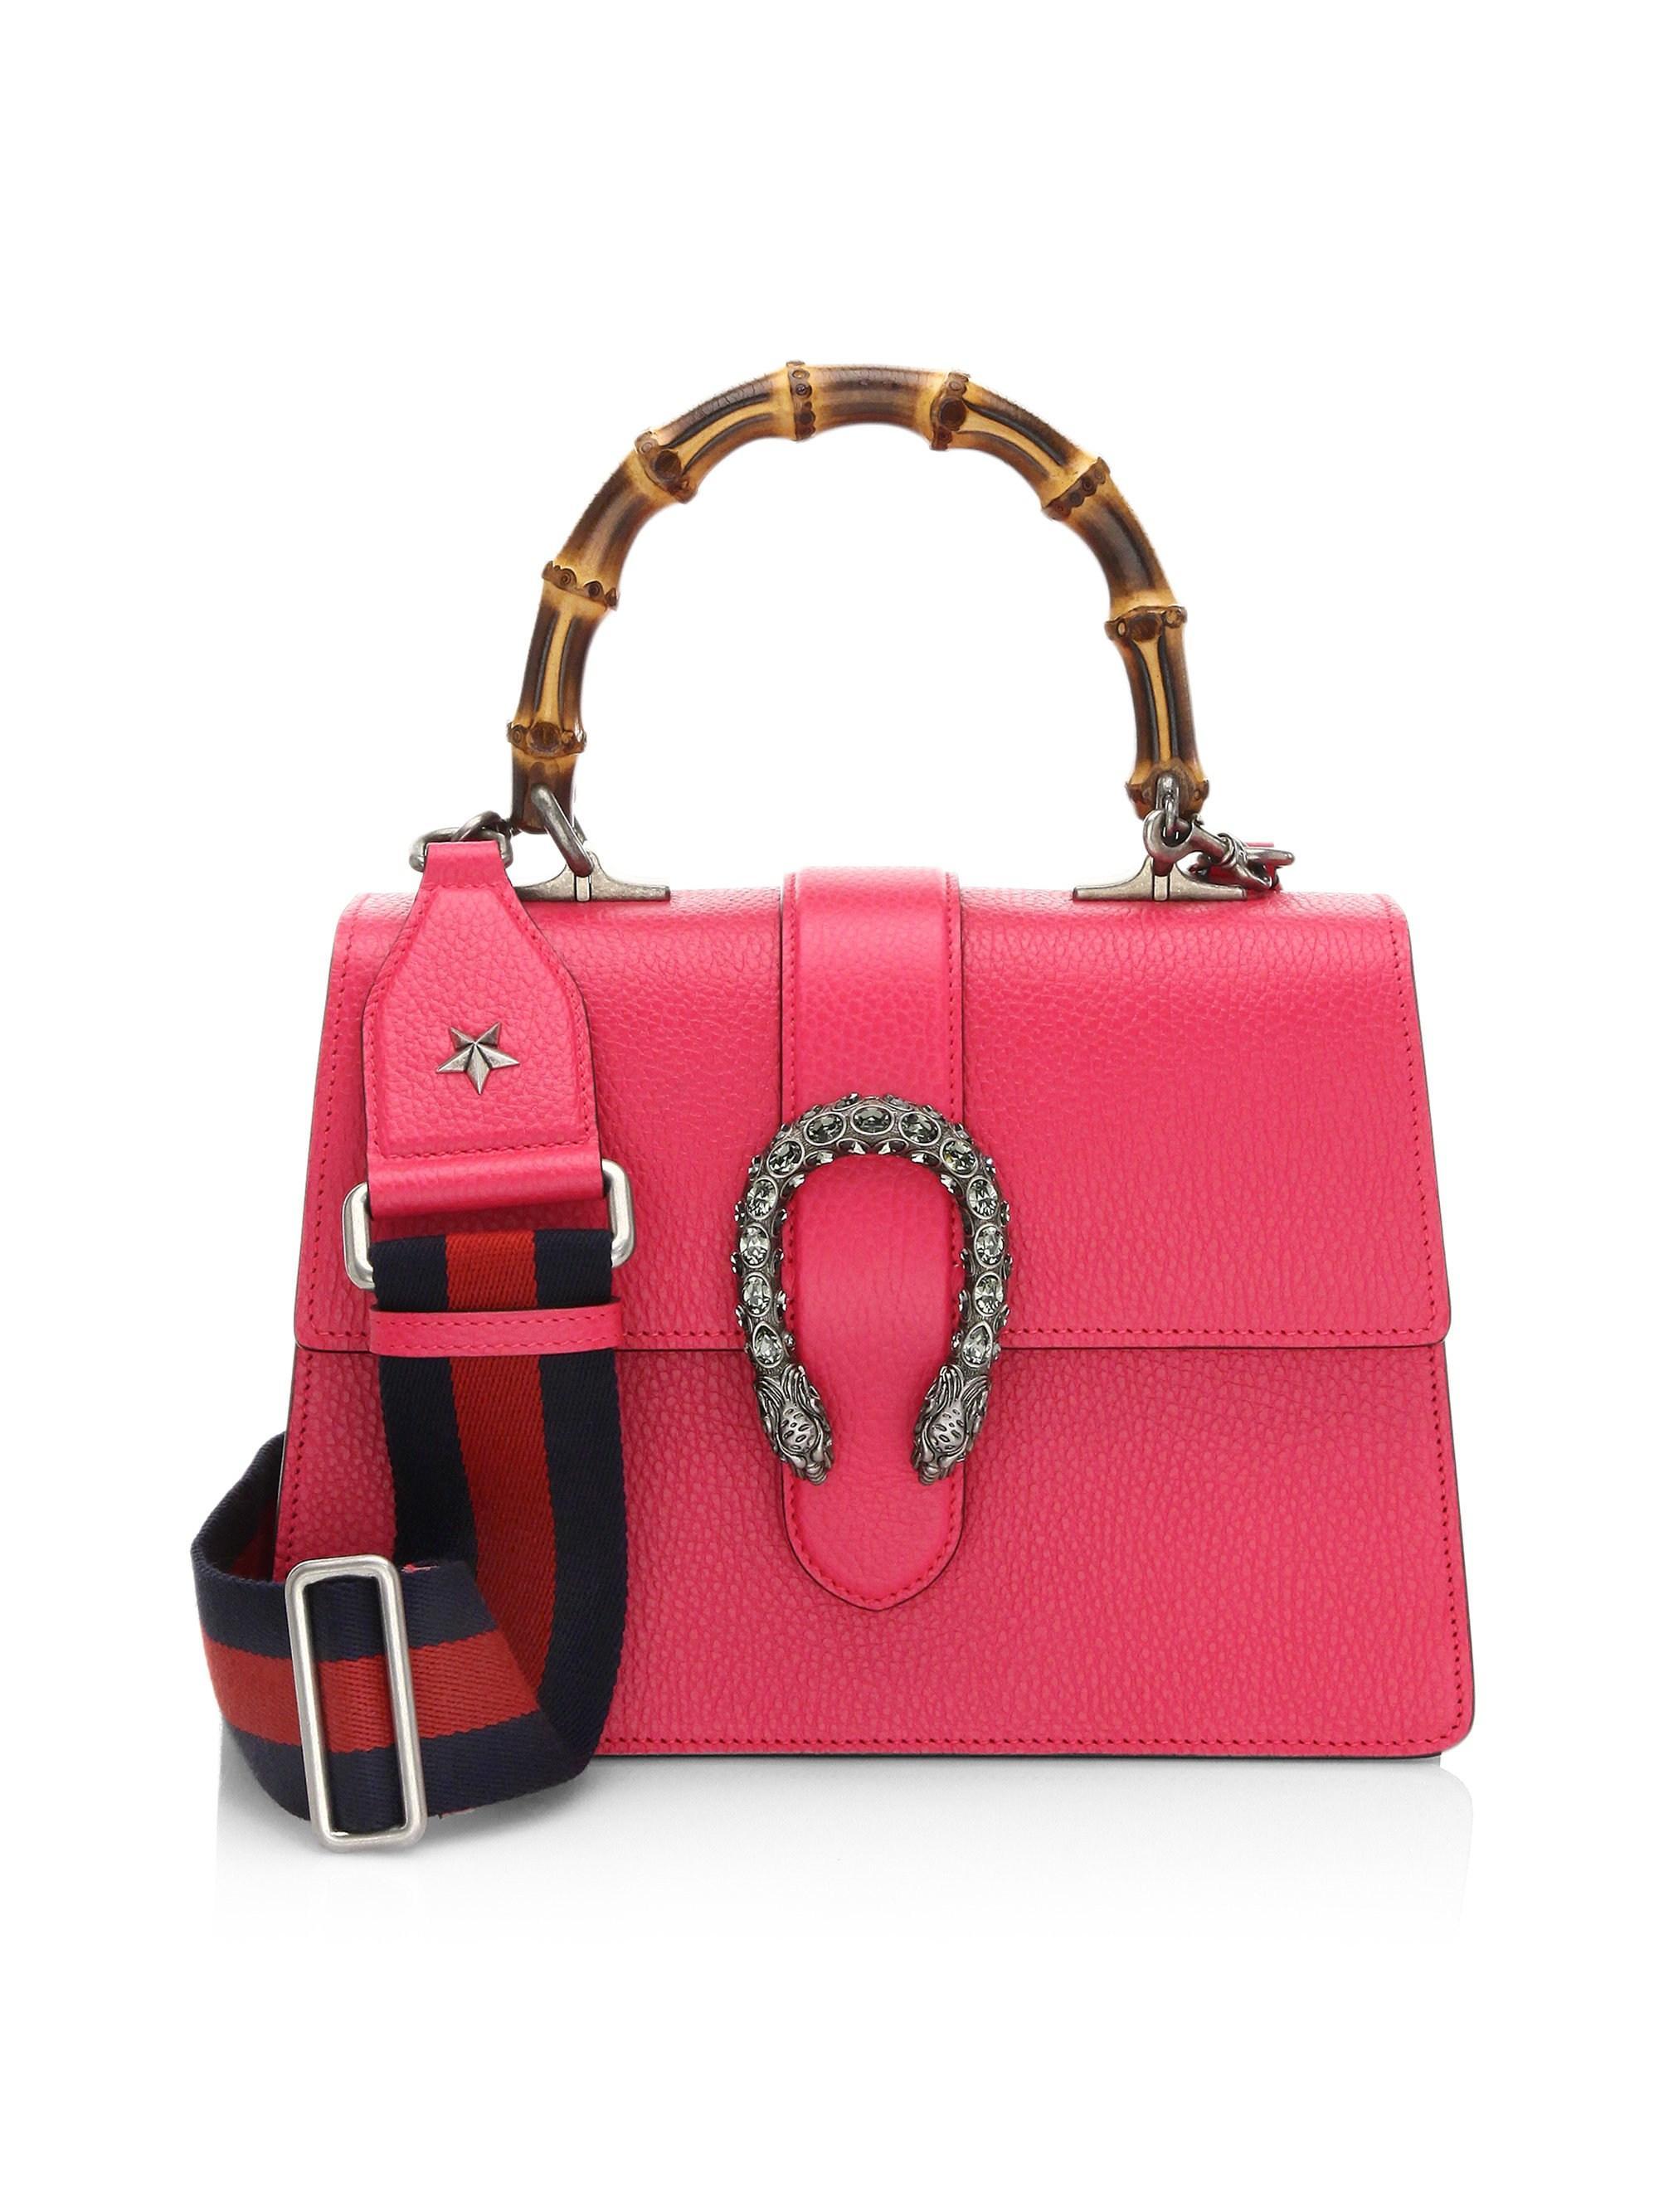 fe61e9f0eb Lyst - Gucci Women s Dionysus Medium Top Handle Bag - Blue in Pink